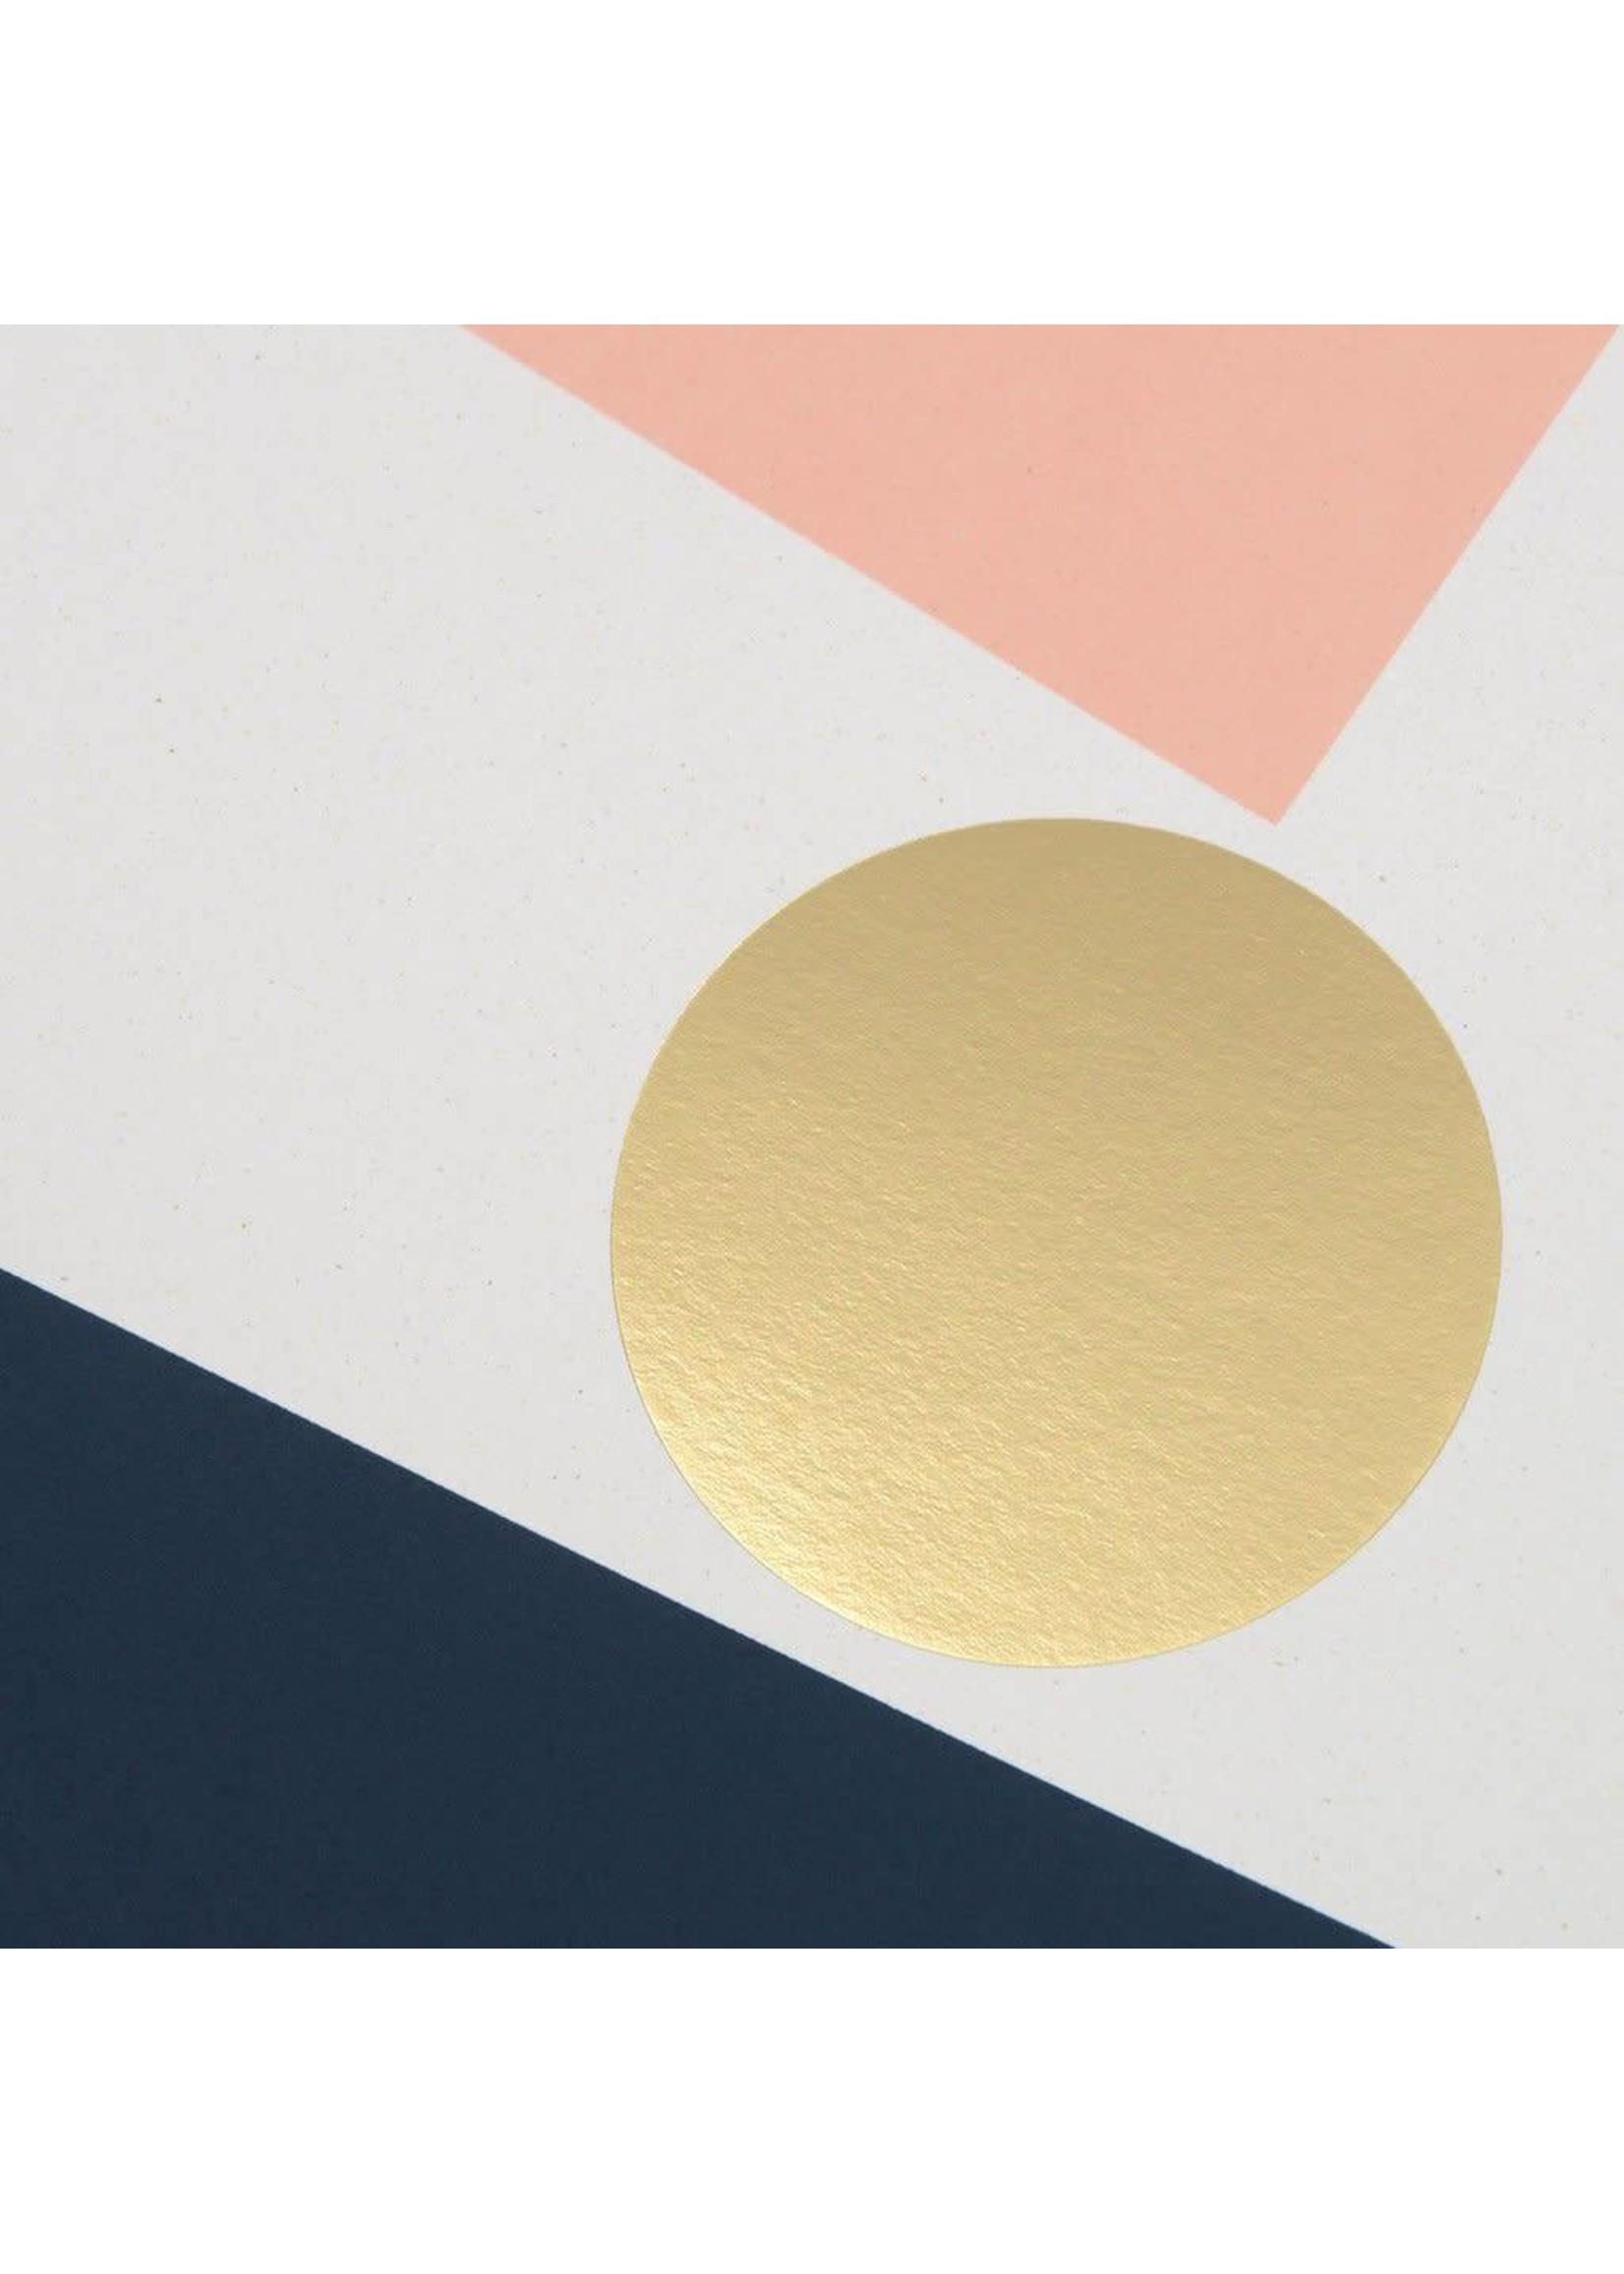 Tom Pigeon Tom Pigeon Balance 2 A2 Print